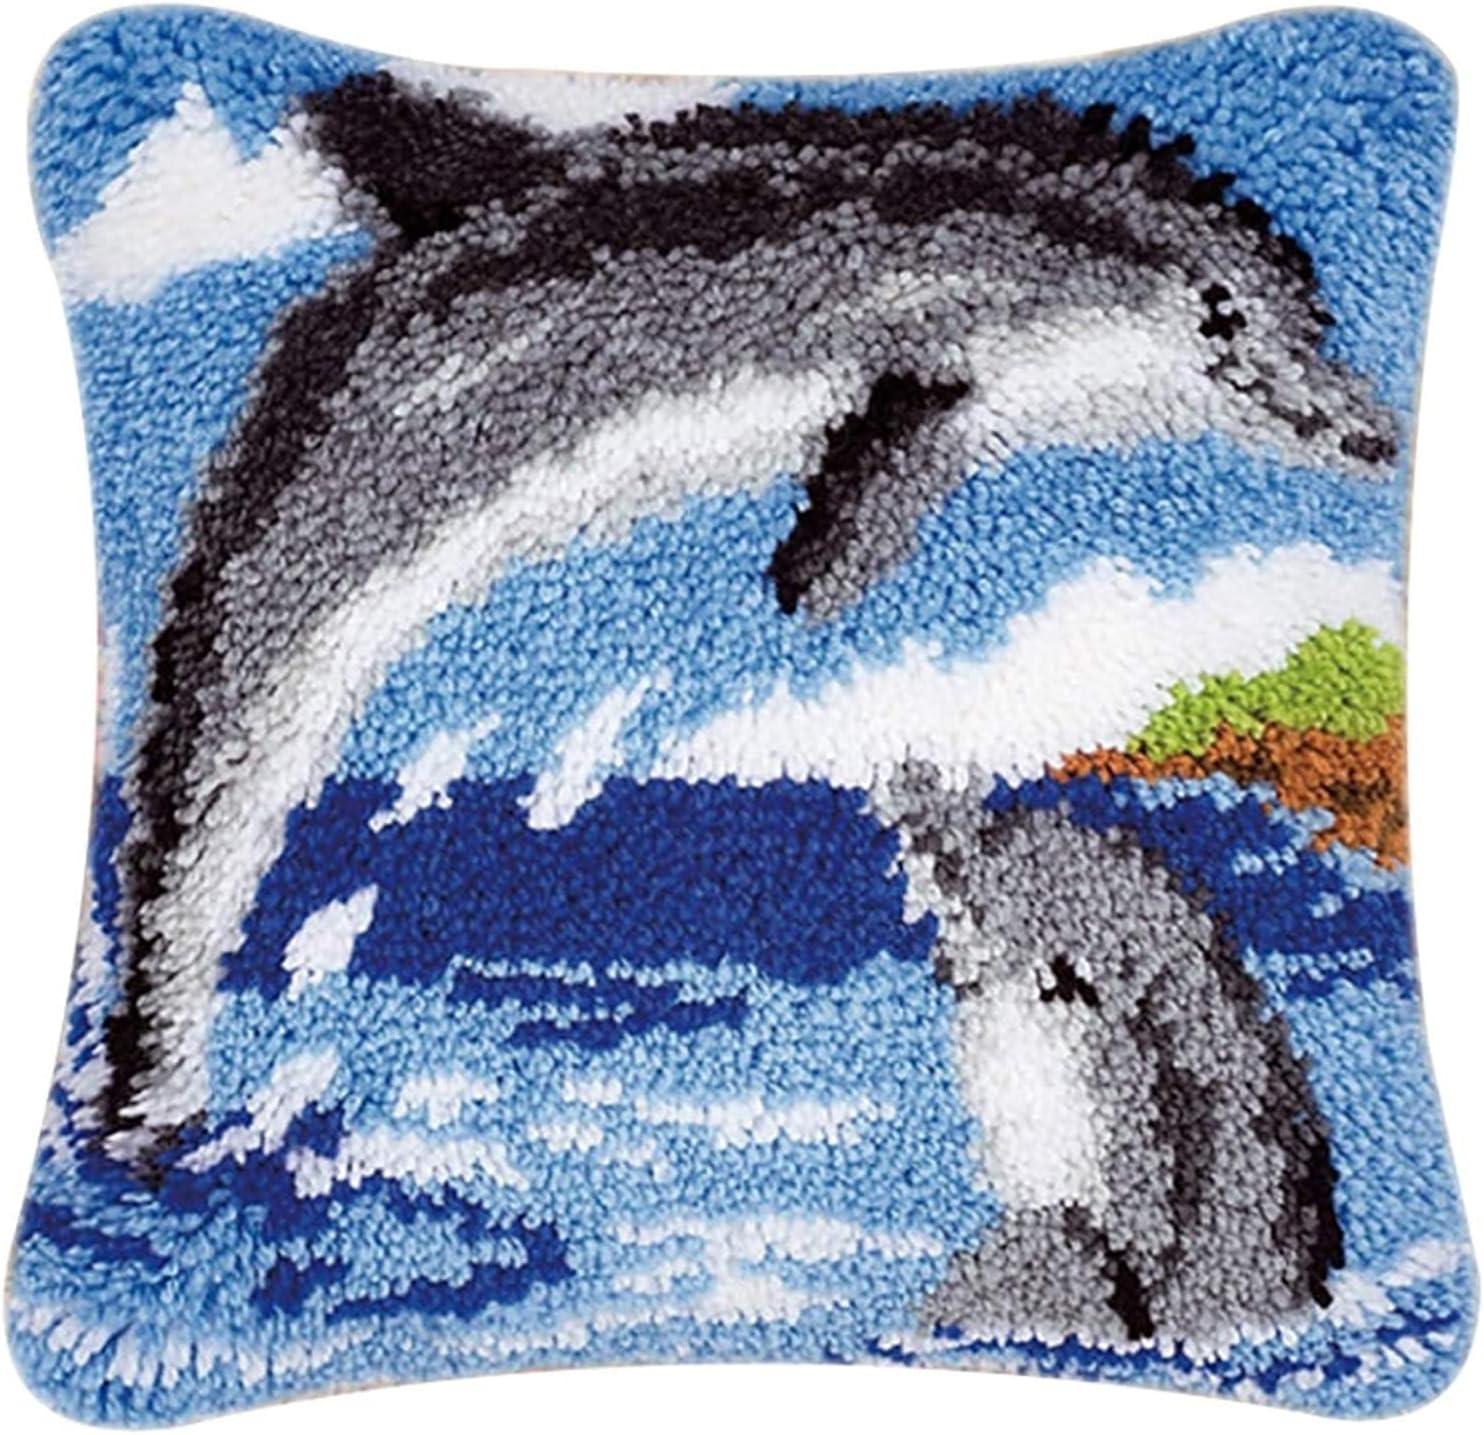 Latch Hook Kits 43cm DIY Max 49% OFF Rug Set Cushion Cus Sewing Pillowcase Direct stock discount